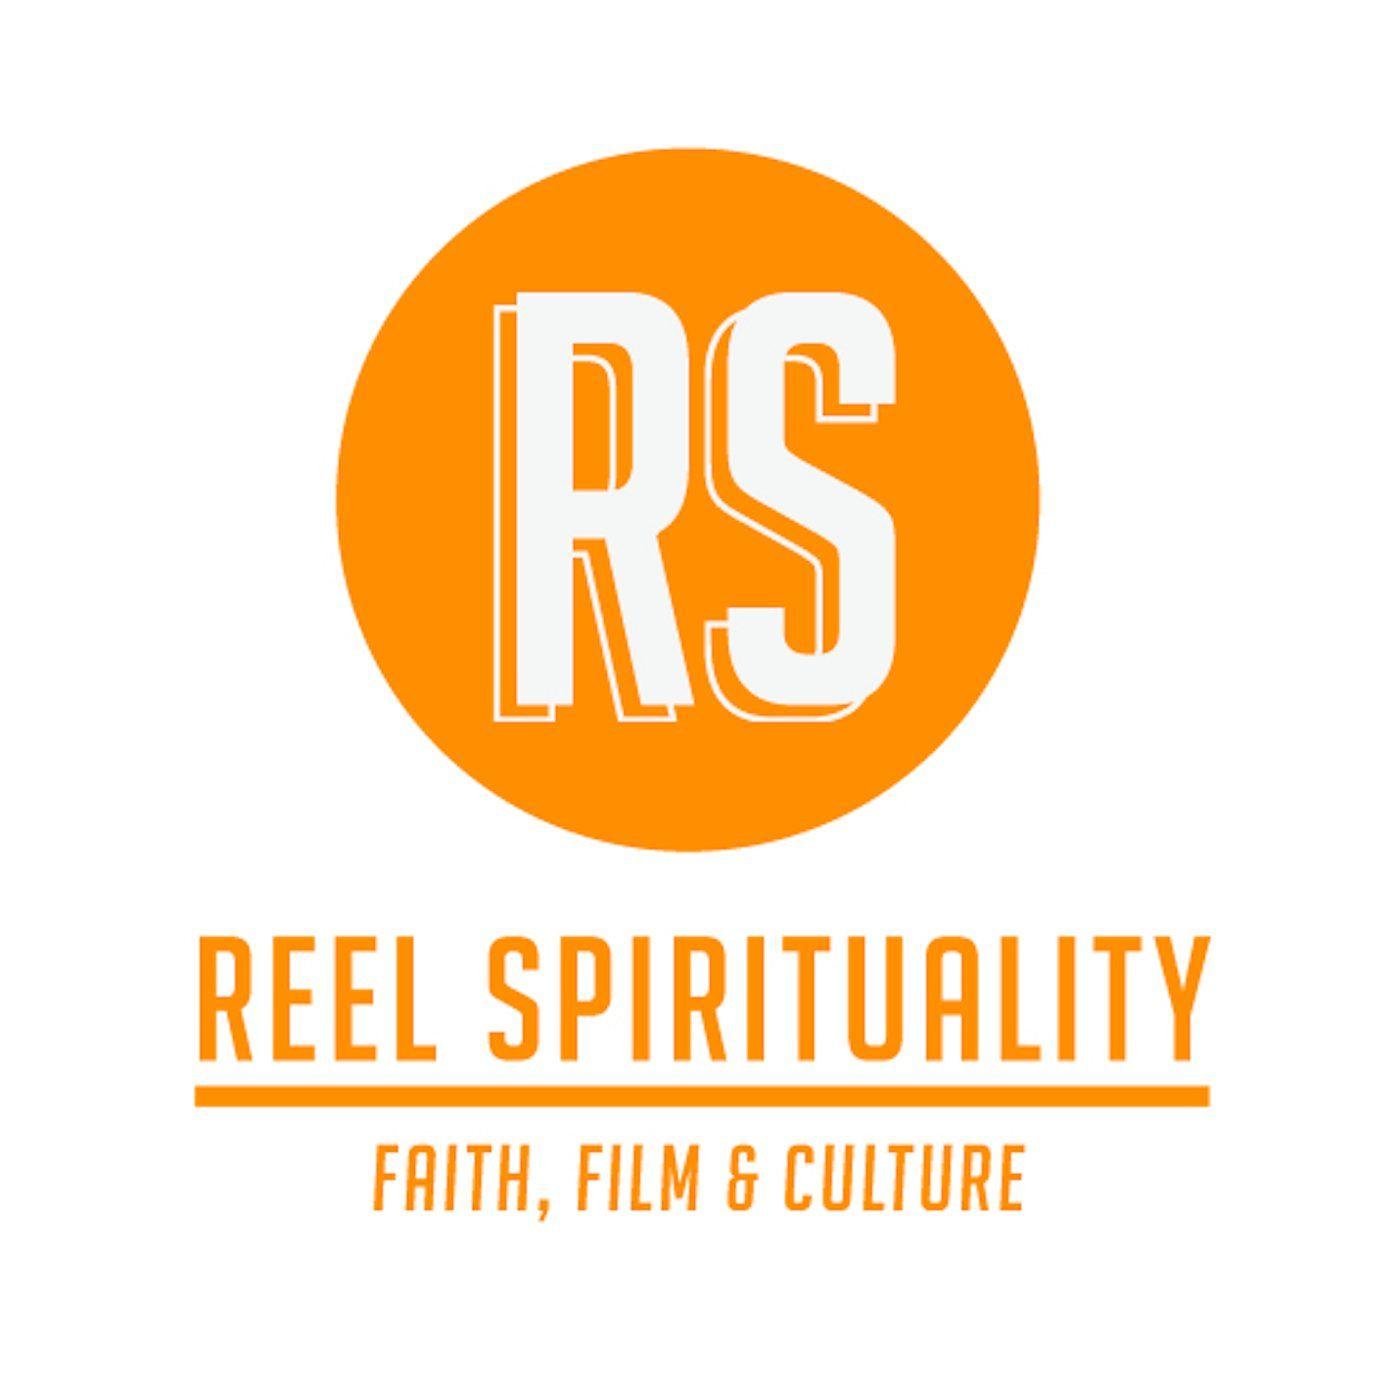 Listen to The Reel Spirituality Podcast episodes free, on